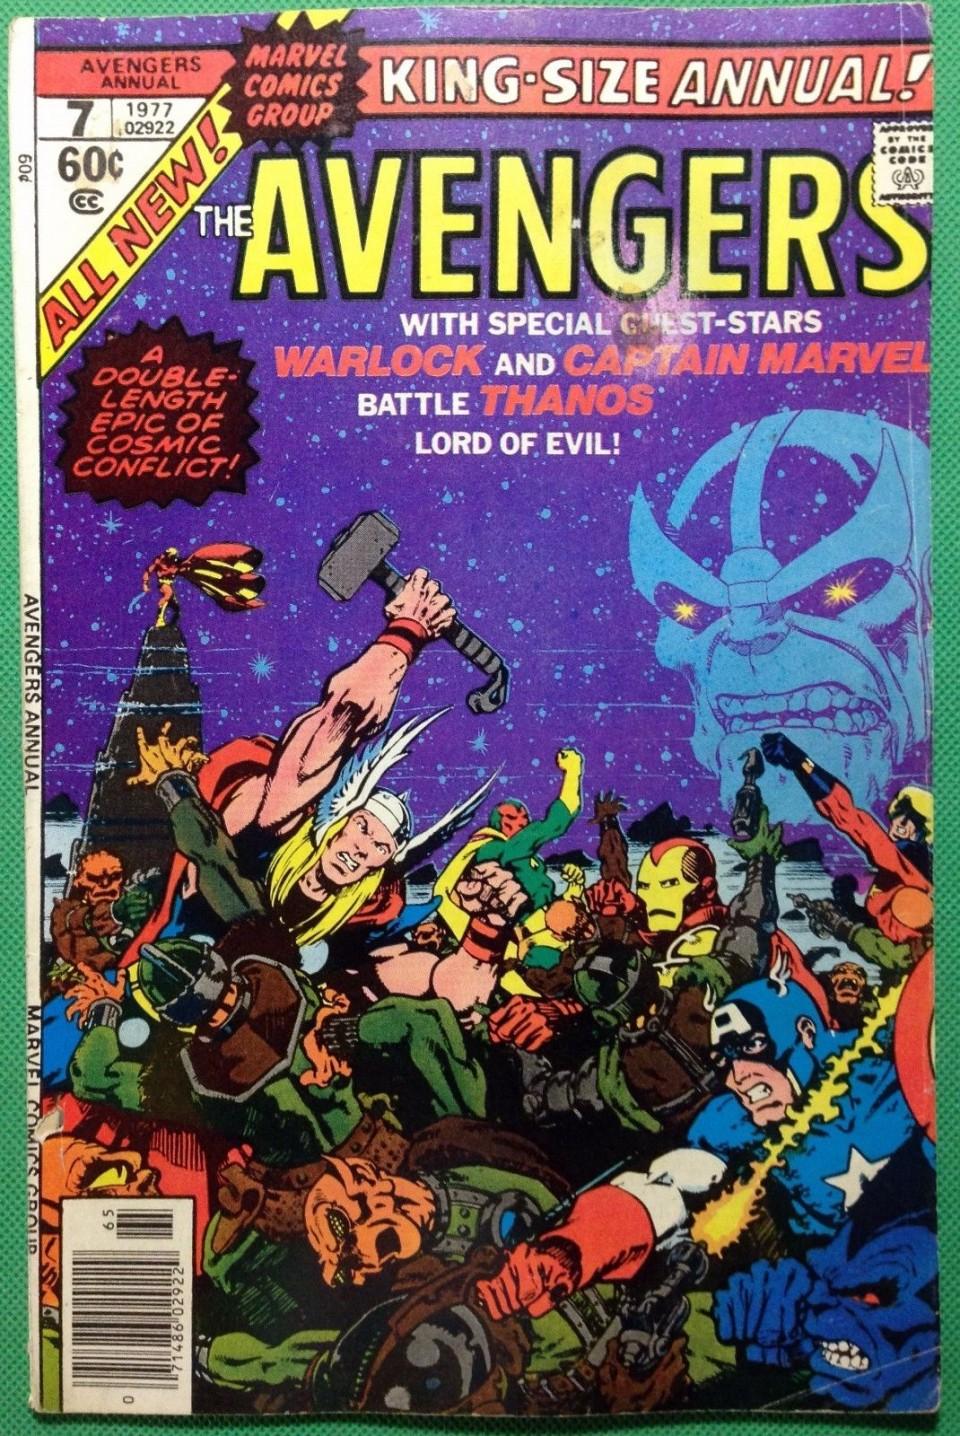 Avengers Annual (1963) #7 FN- (5 5) Death of Warlock Thanos app